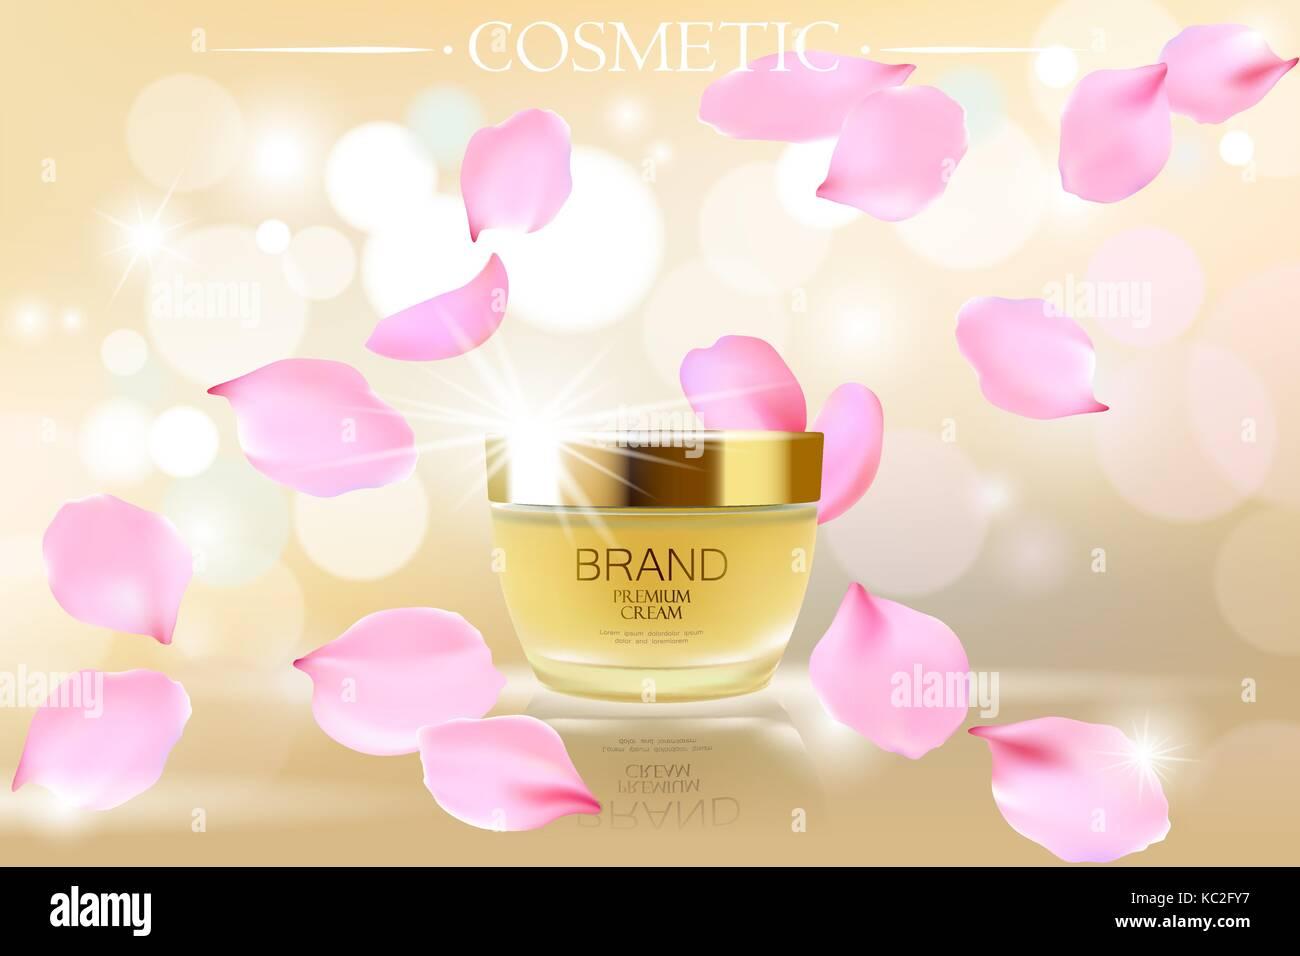 Golden Skin Care Creme Kosmetik Ads Realistische 3d Vektor